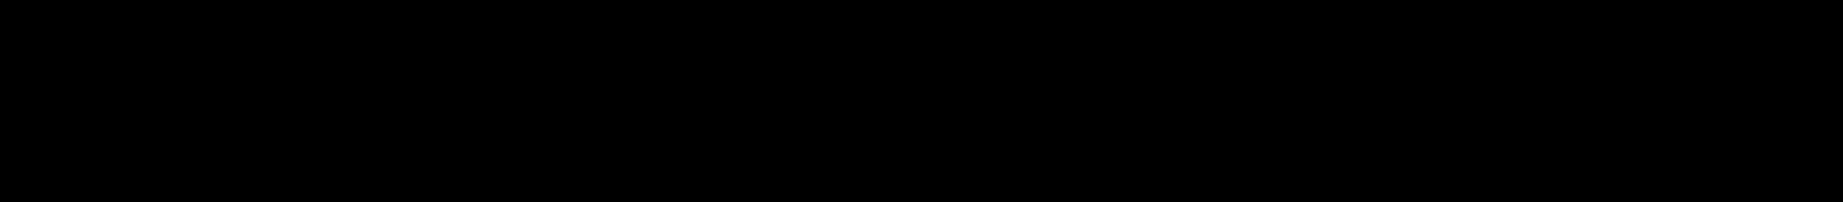 Cavole Slab Medium Italic